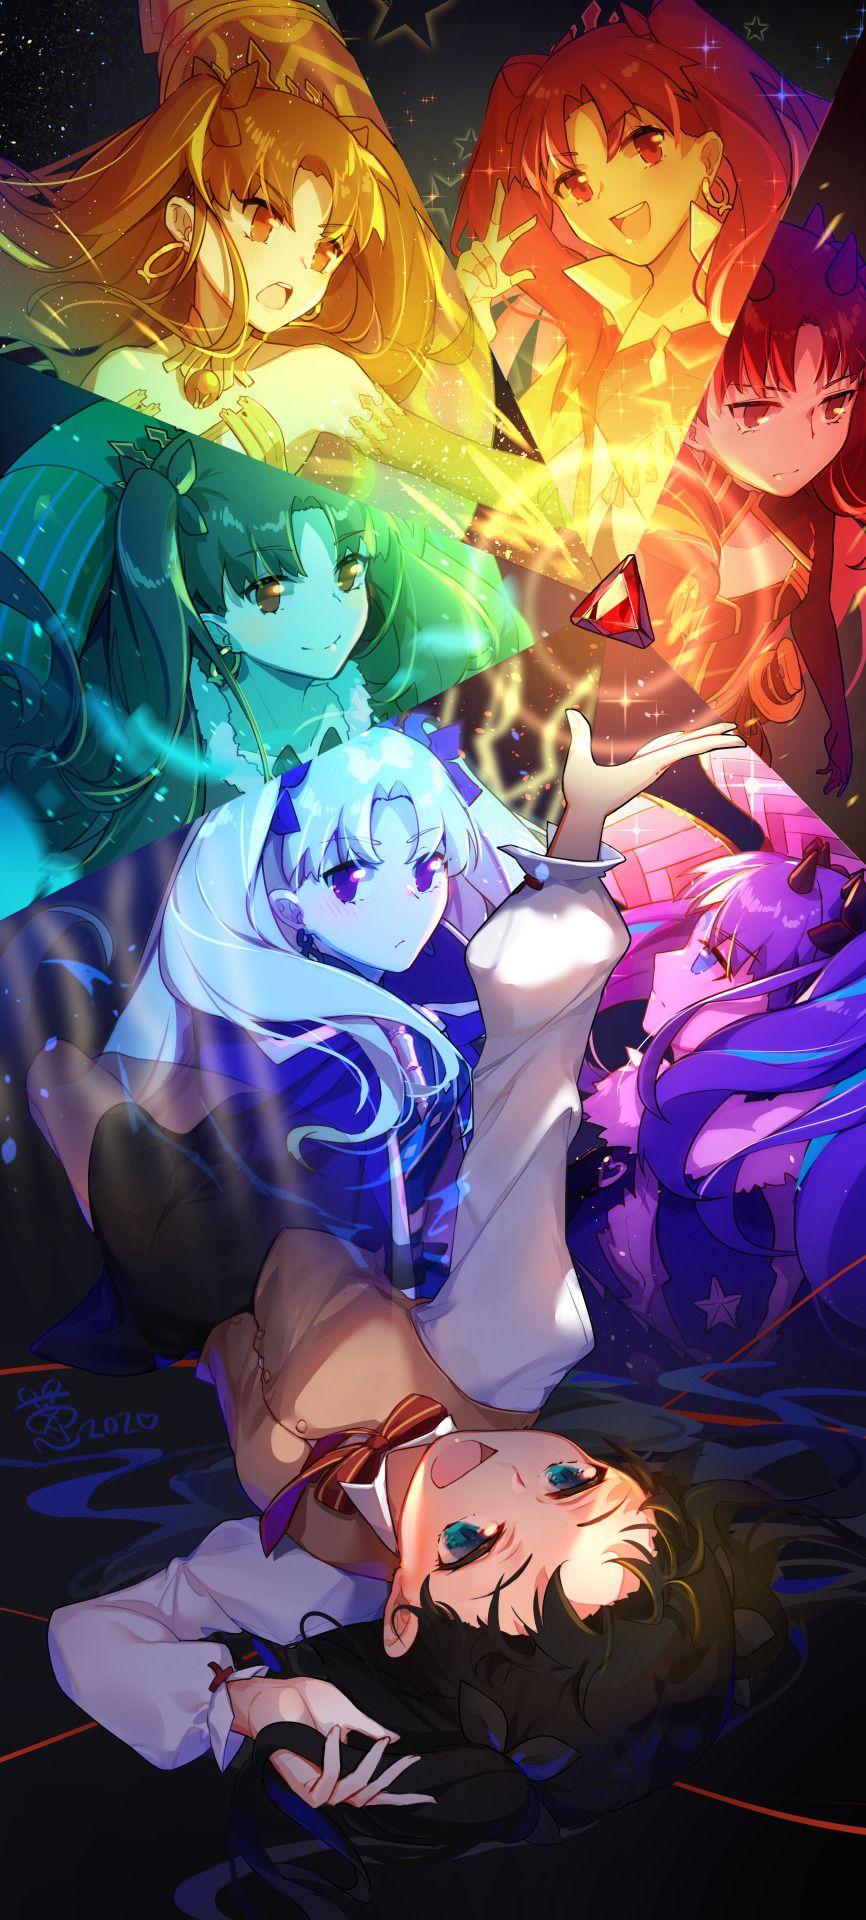 animepopheart Kaya被爐萱 rin (fate series) republished w